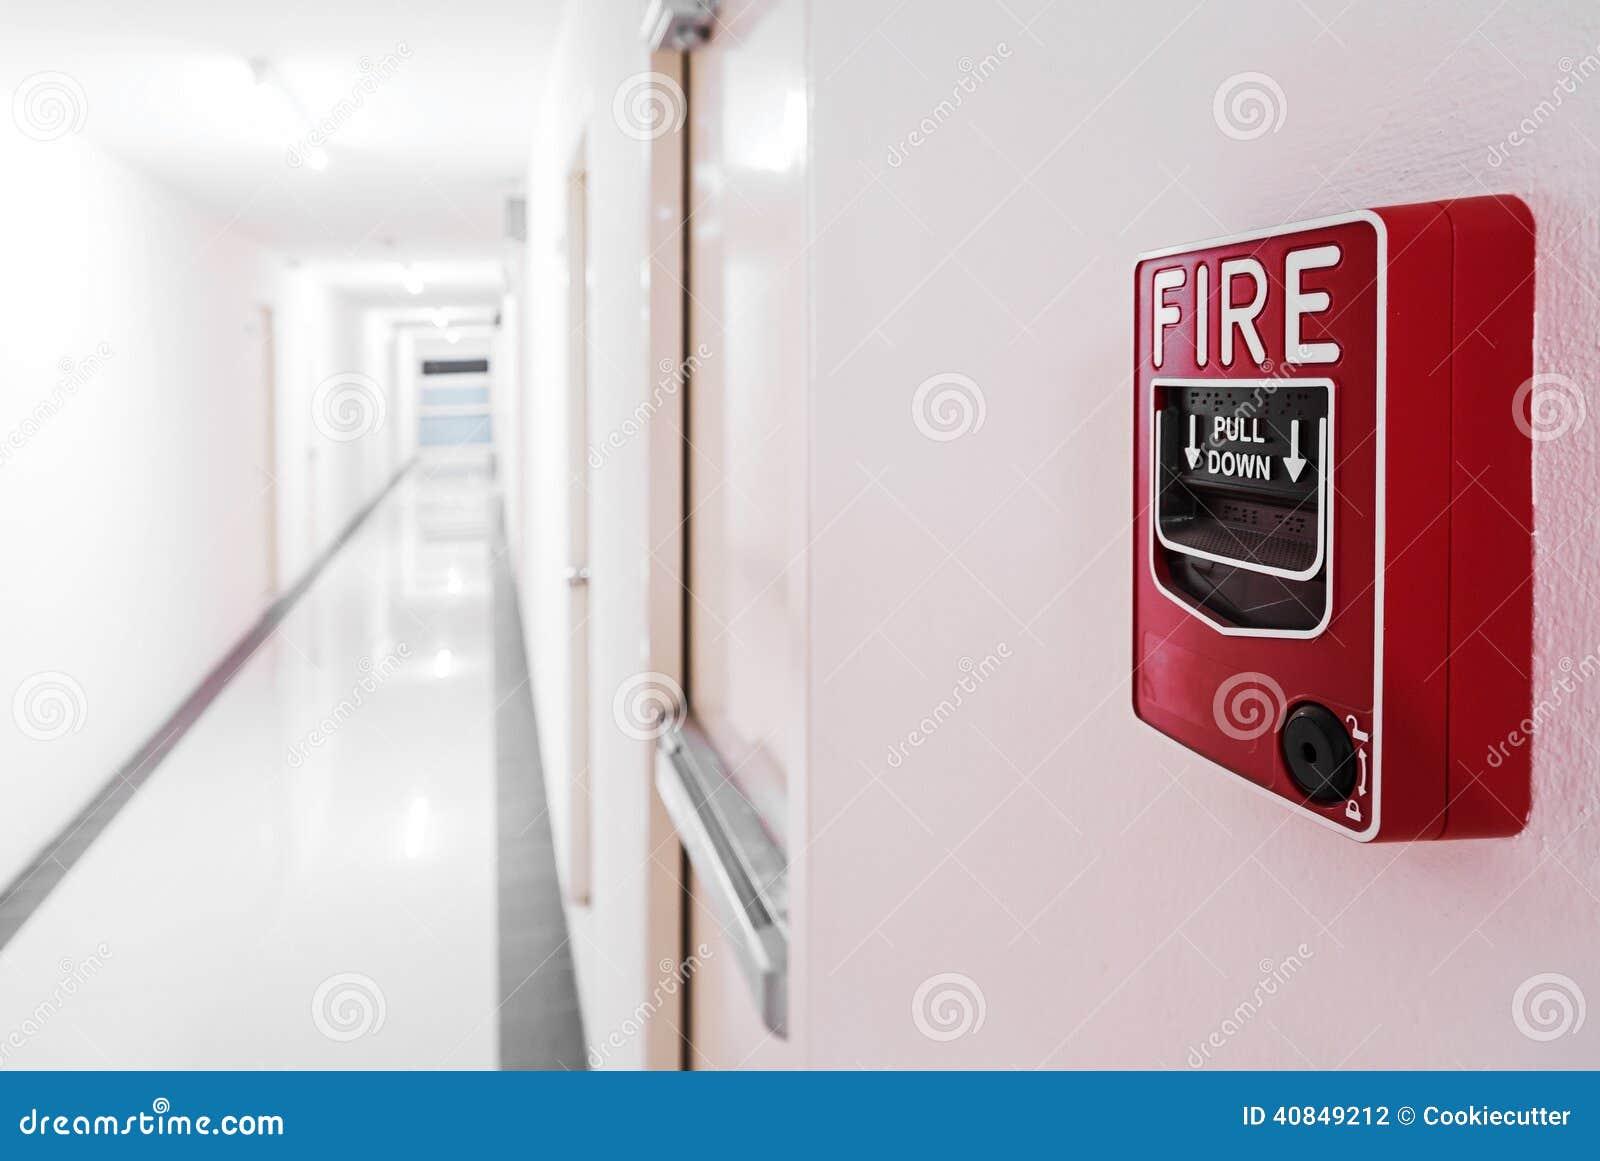 Brandalarm dichtbij de deur van de deurnooduitgang